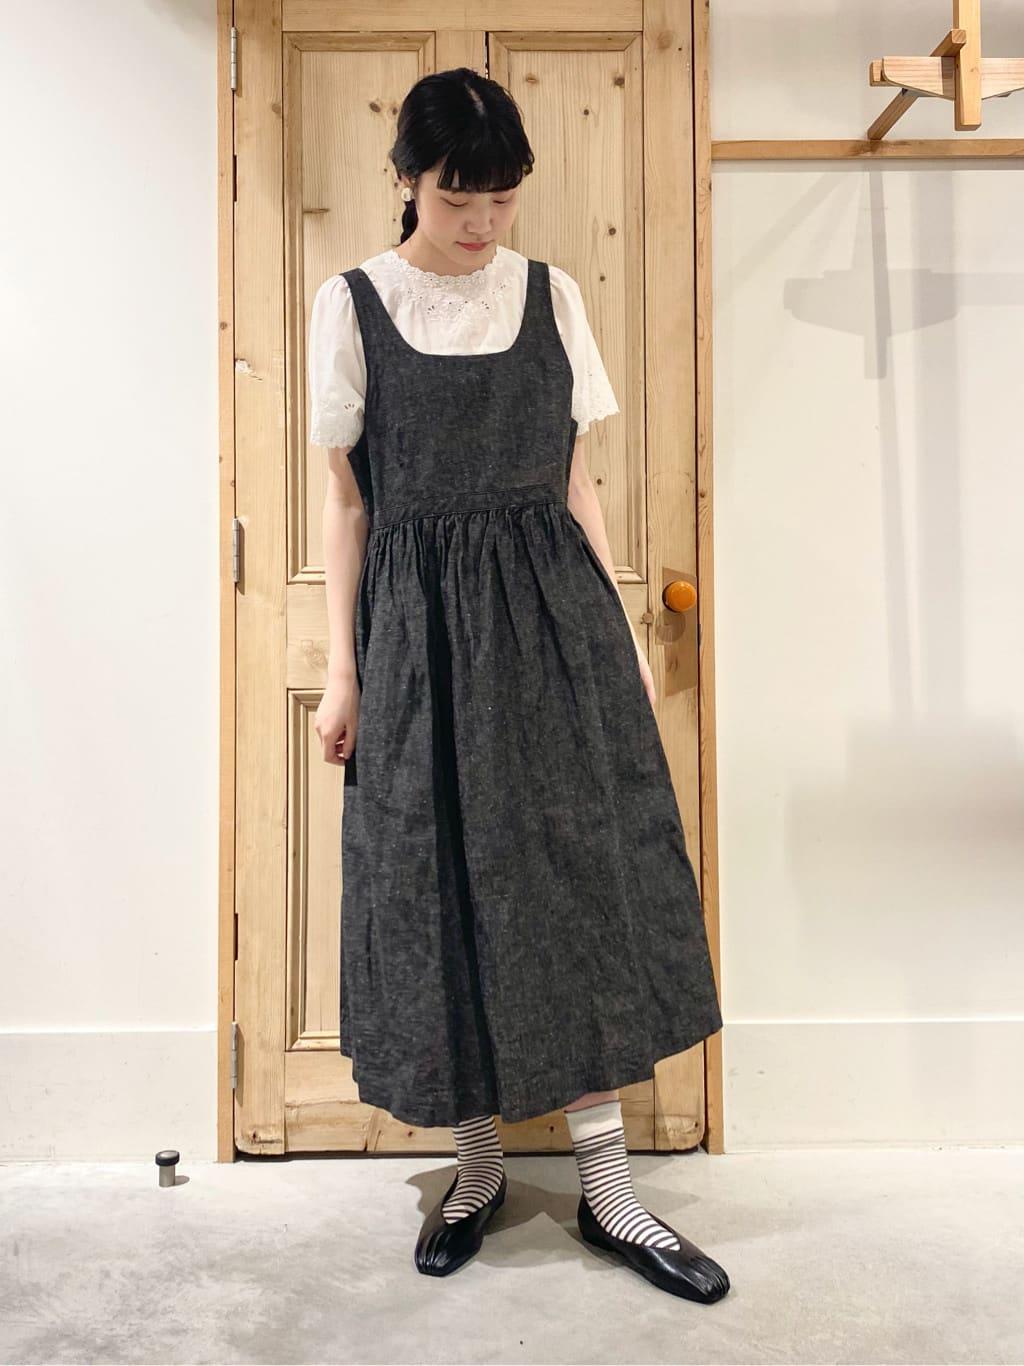 Malle chambre de charme 調布パルコ 身長:167cm 2021.07.09